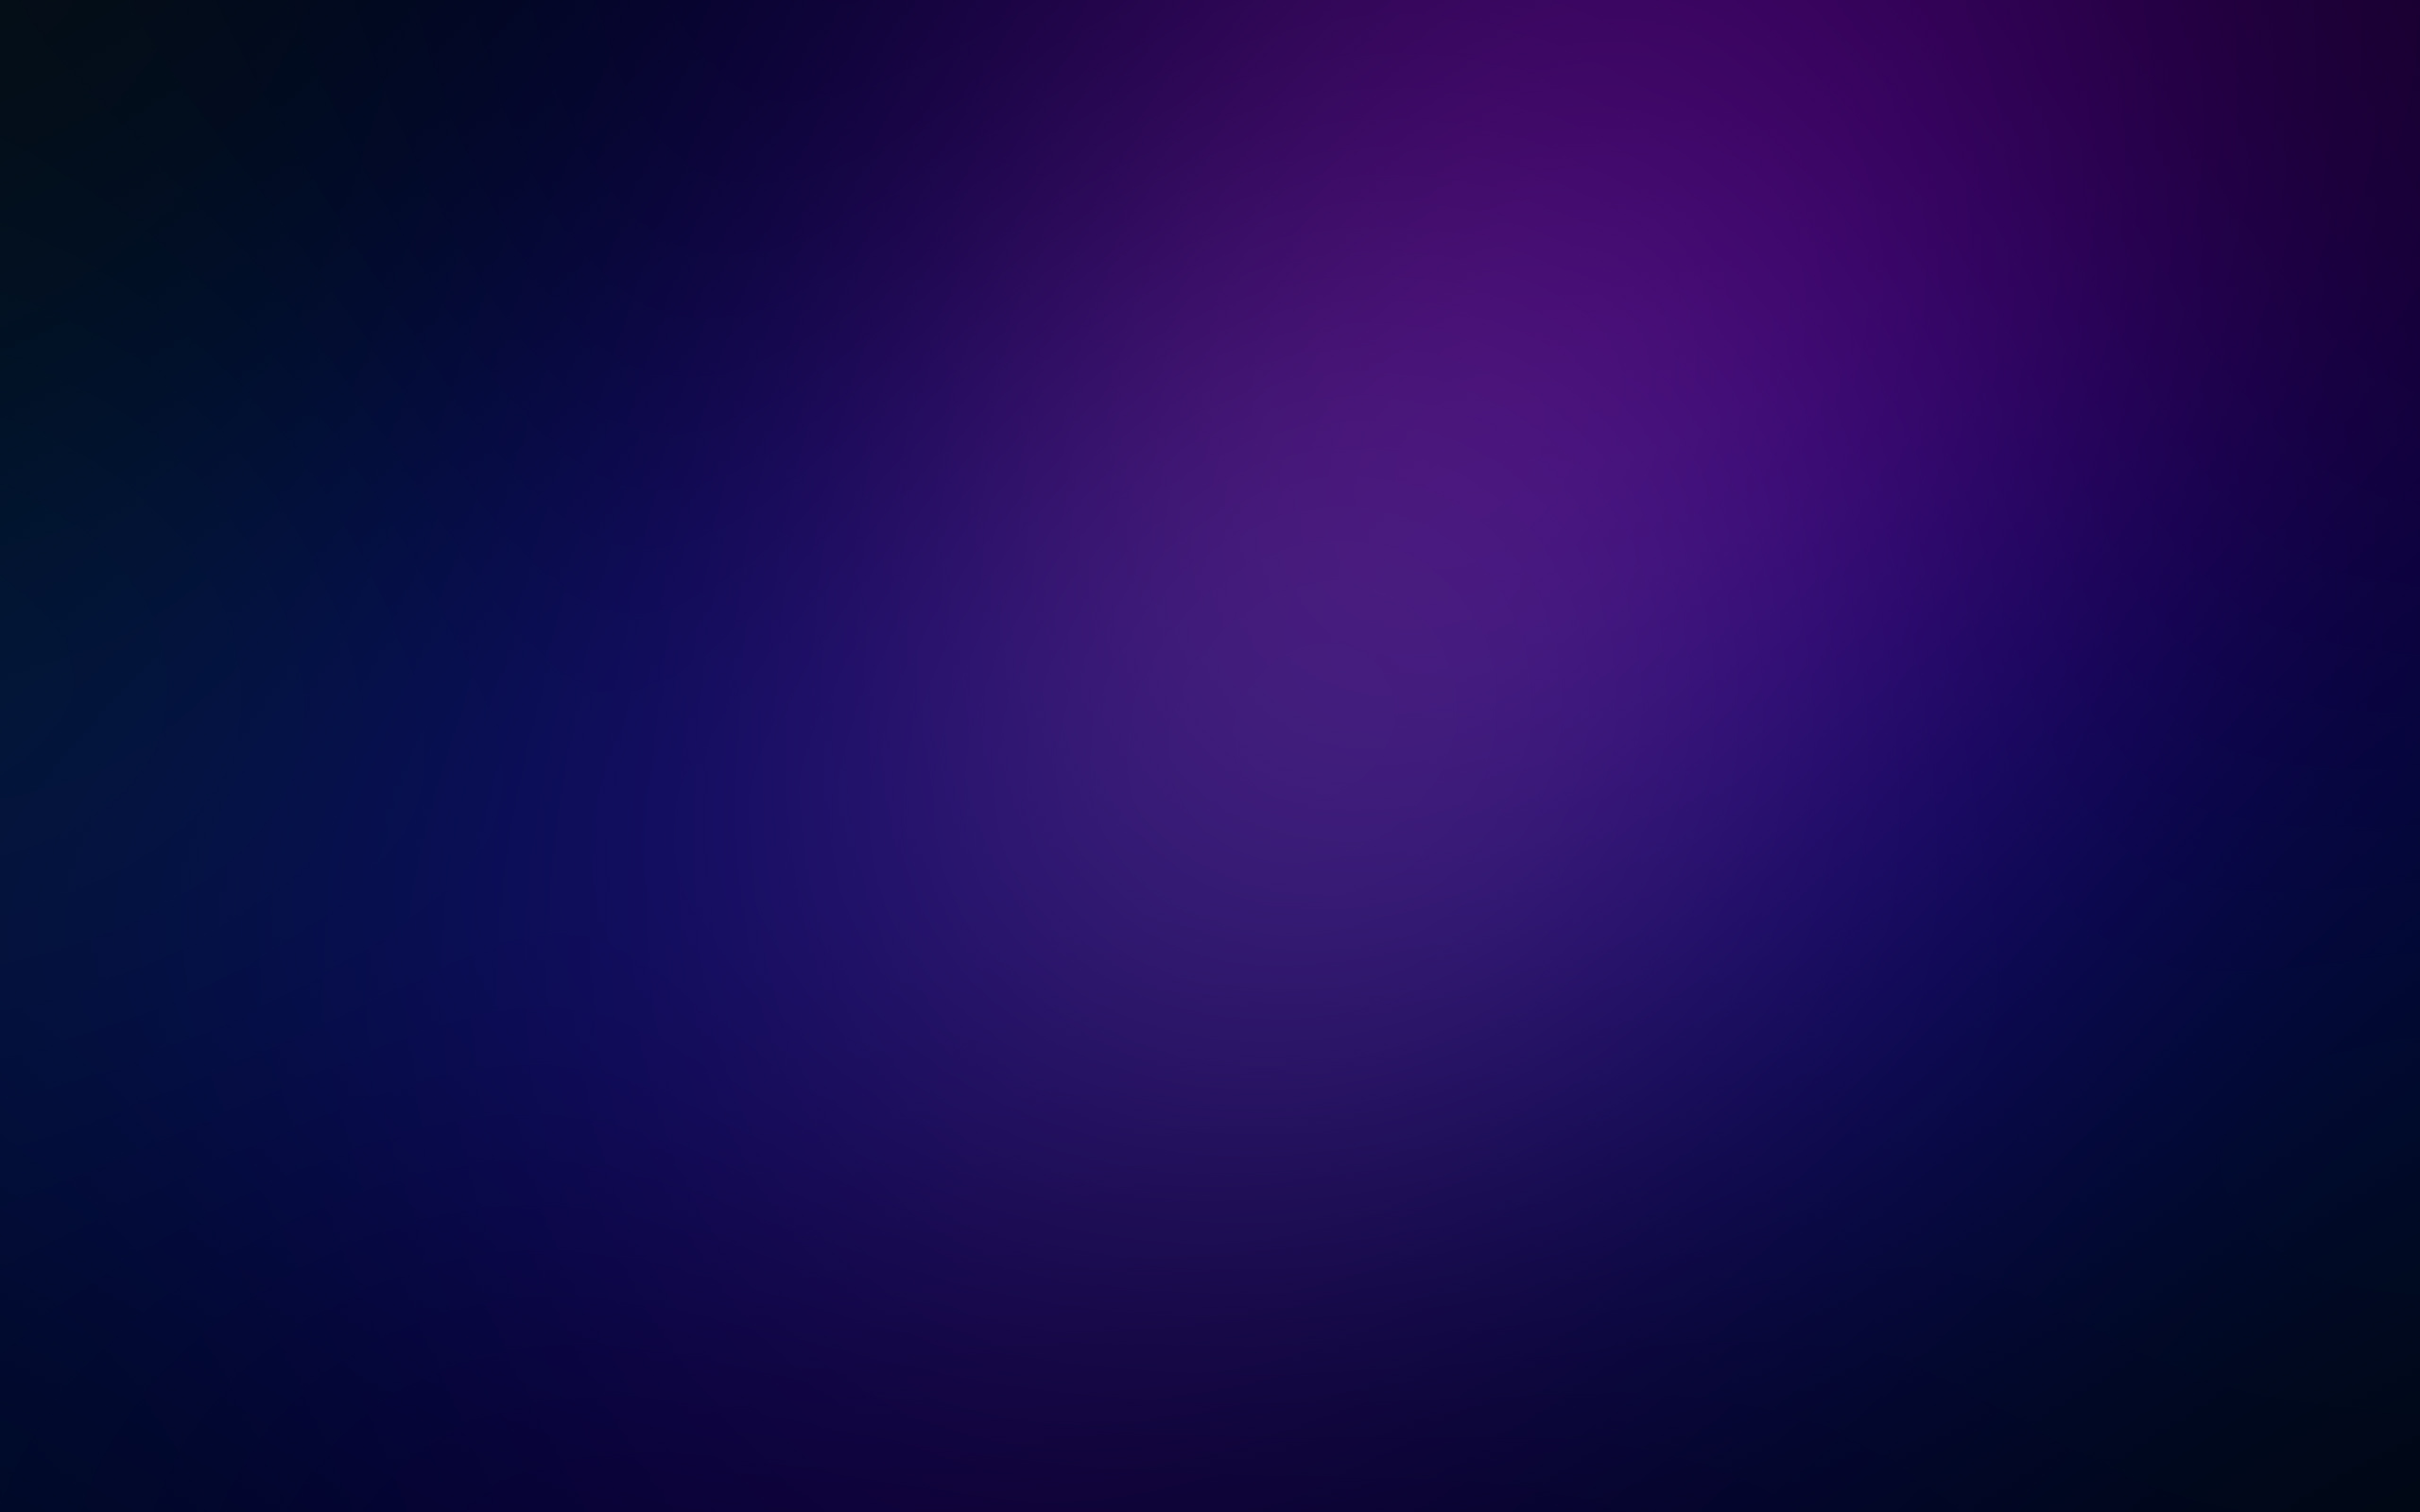 Purple Blur by DomBurrows Purple Blur by DomBurrows